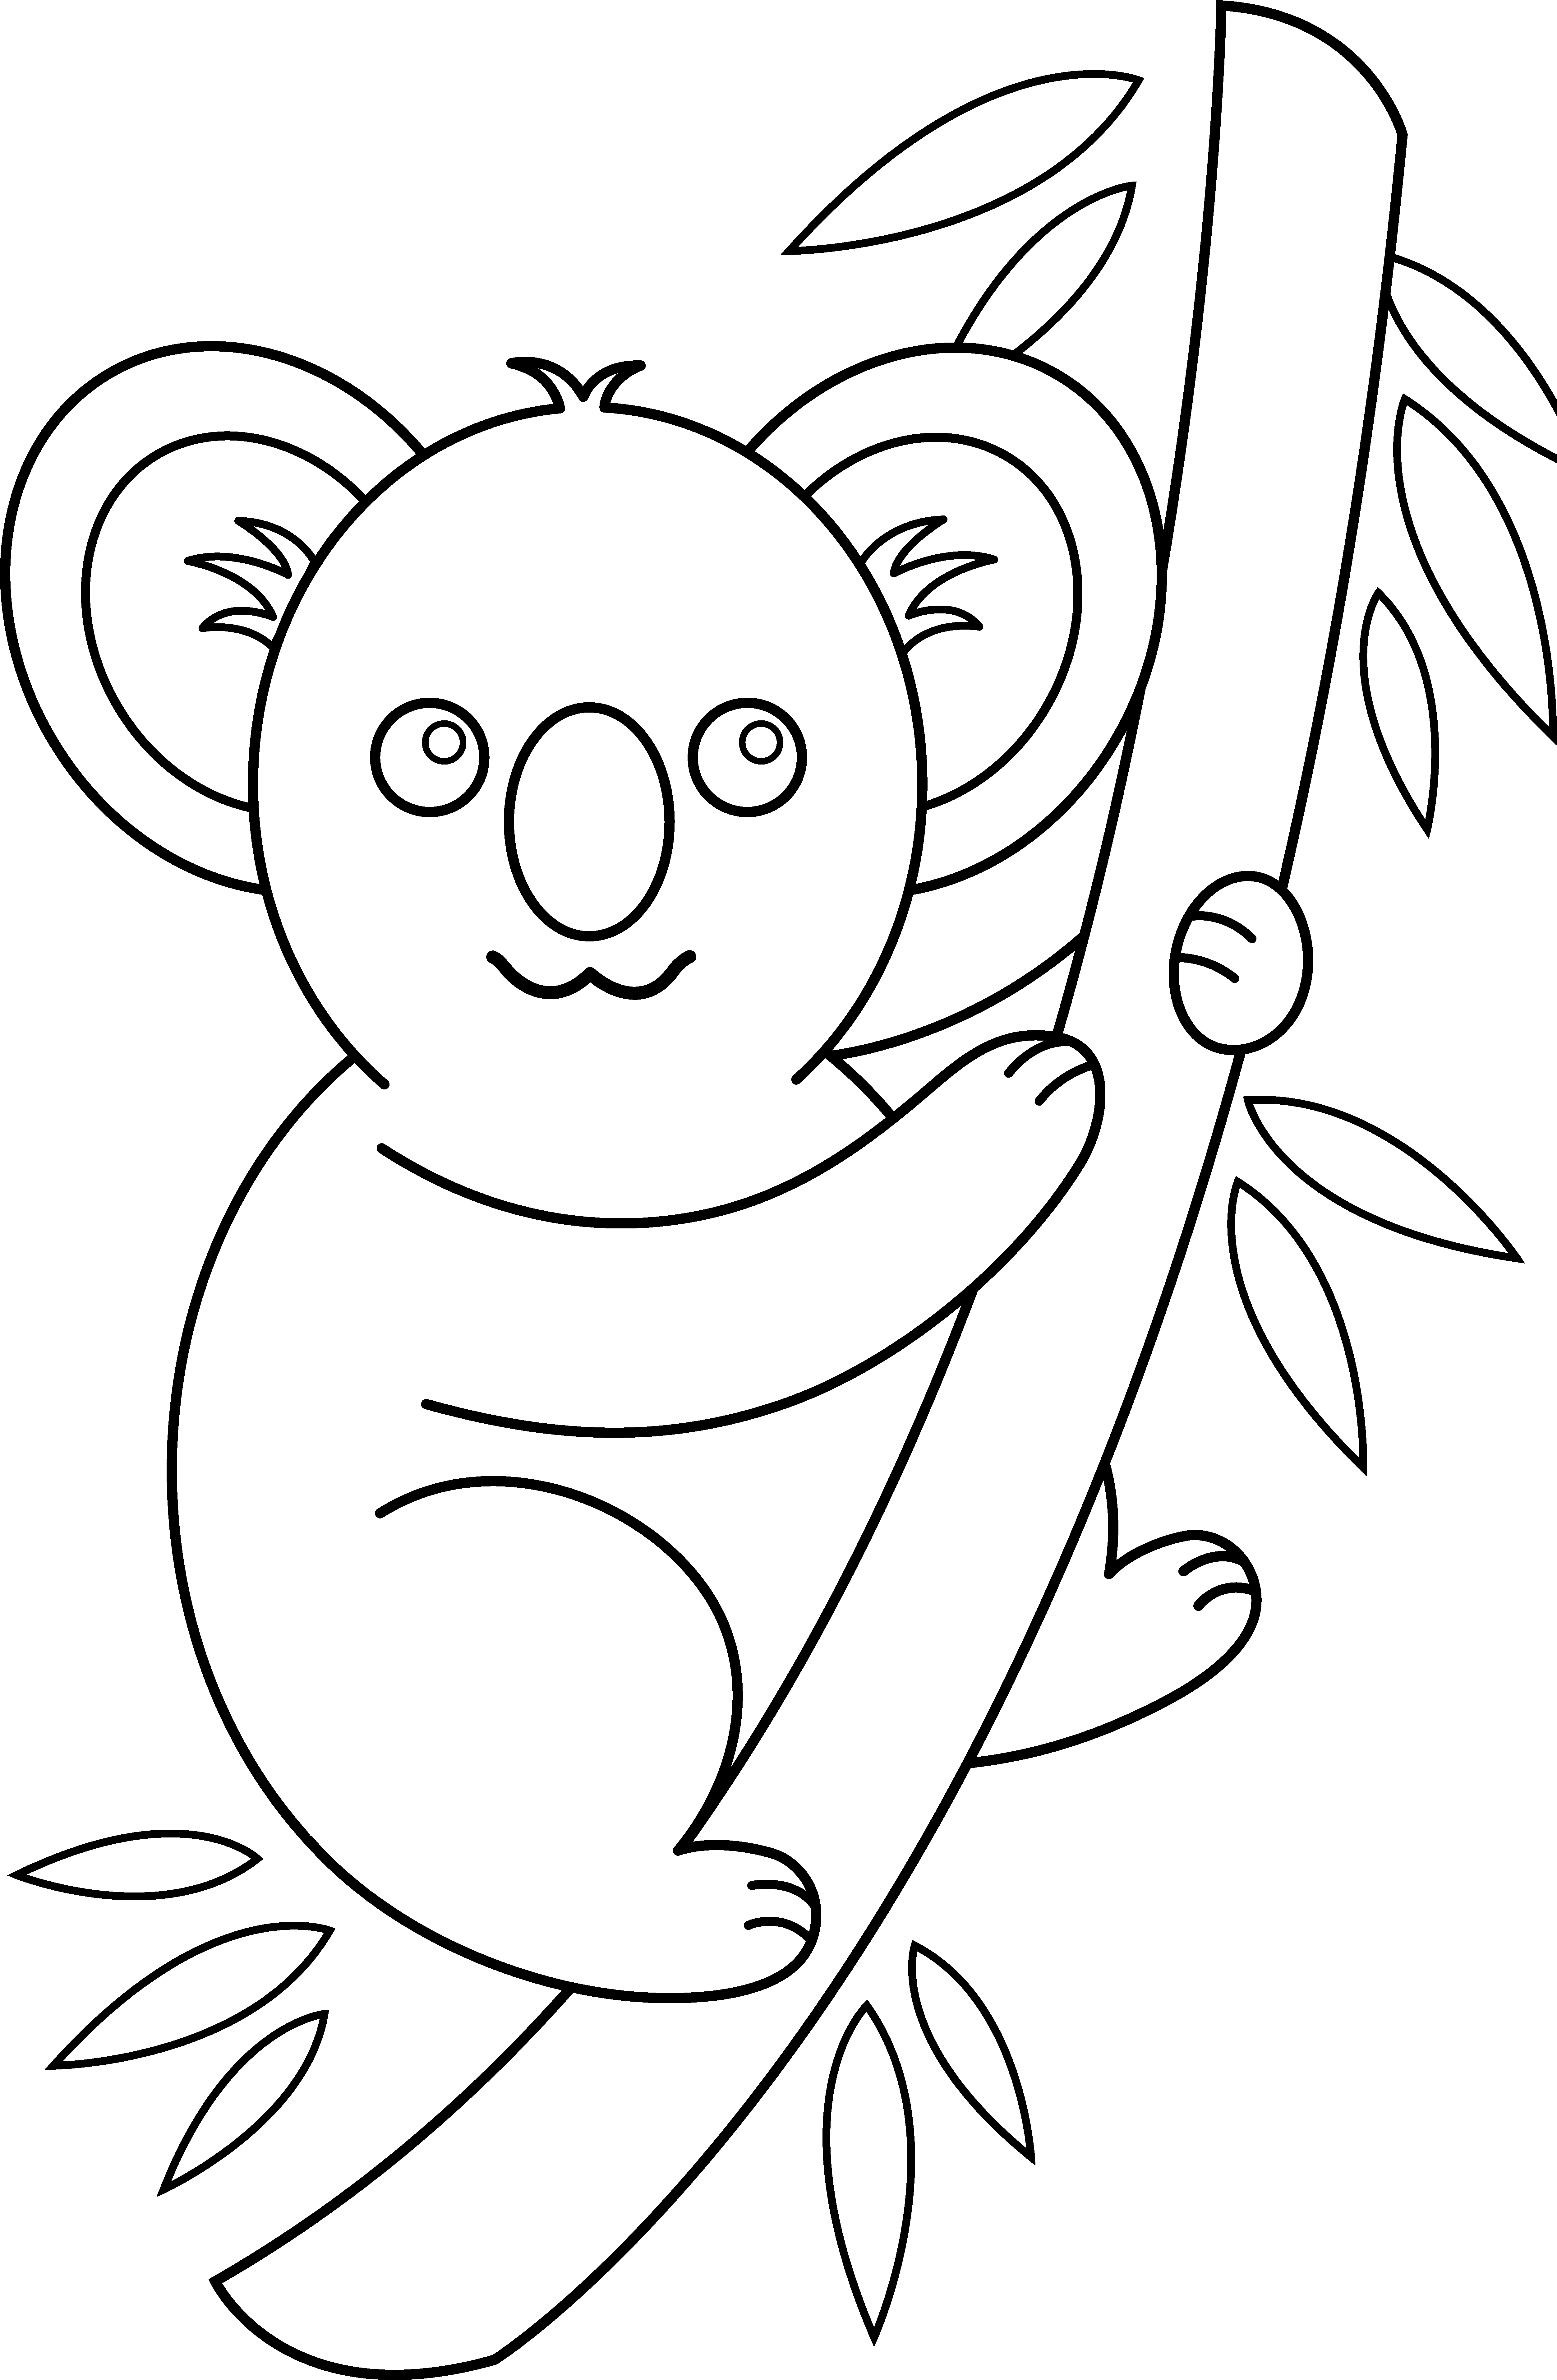 Koala Drawing at GetDrawings.com | Free for personal use Koala ...